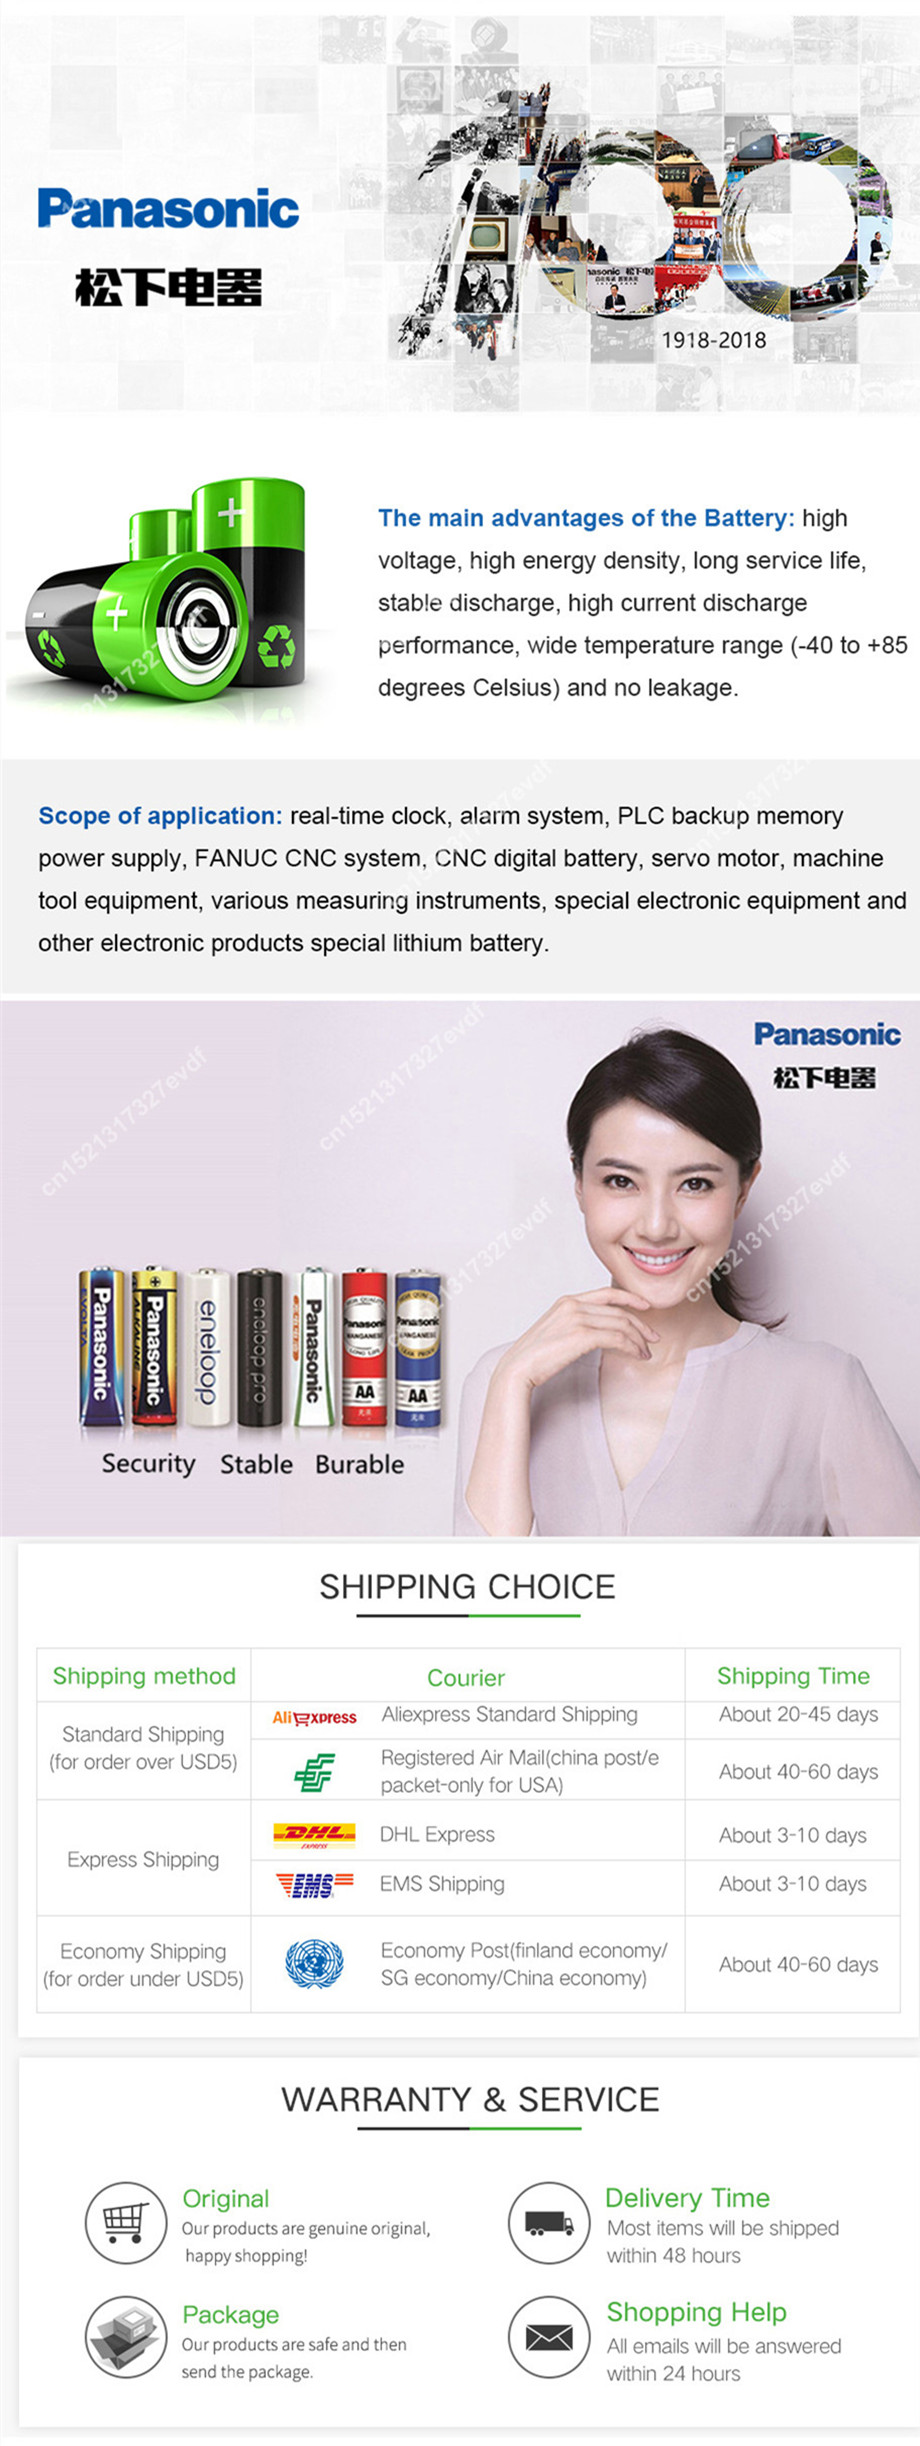 200 pçs lote 3V cr2032 Coin Bateria